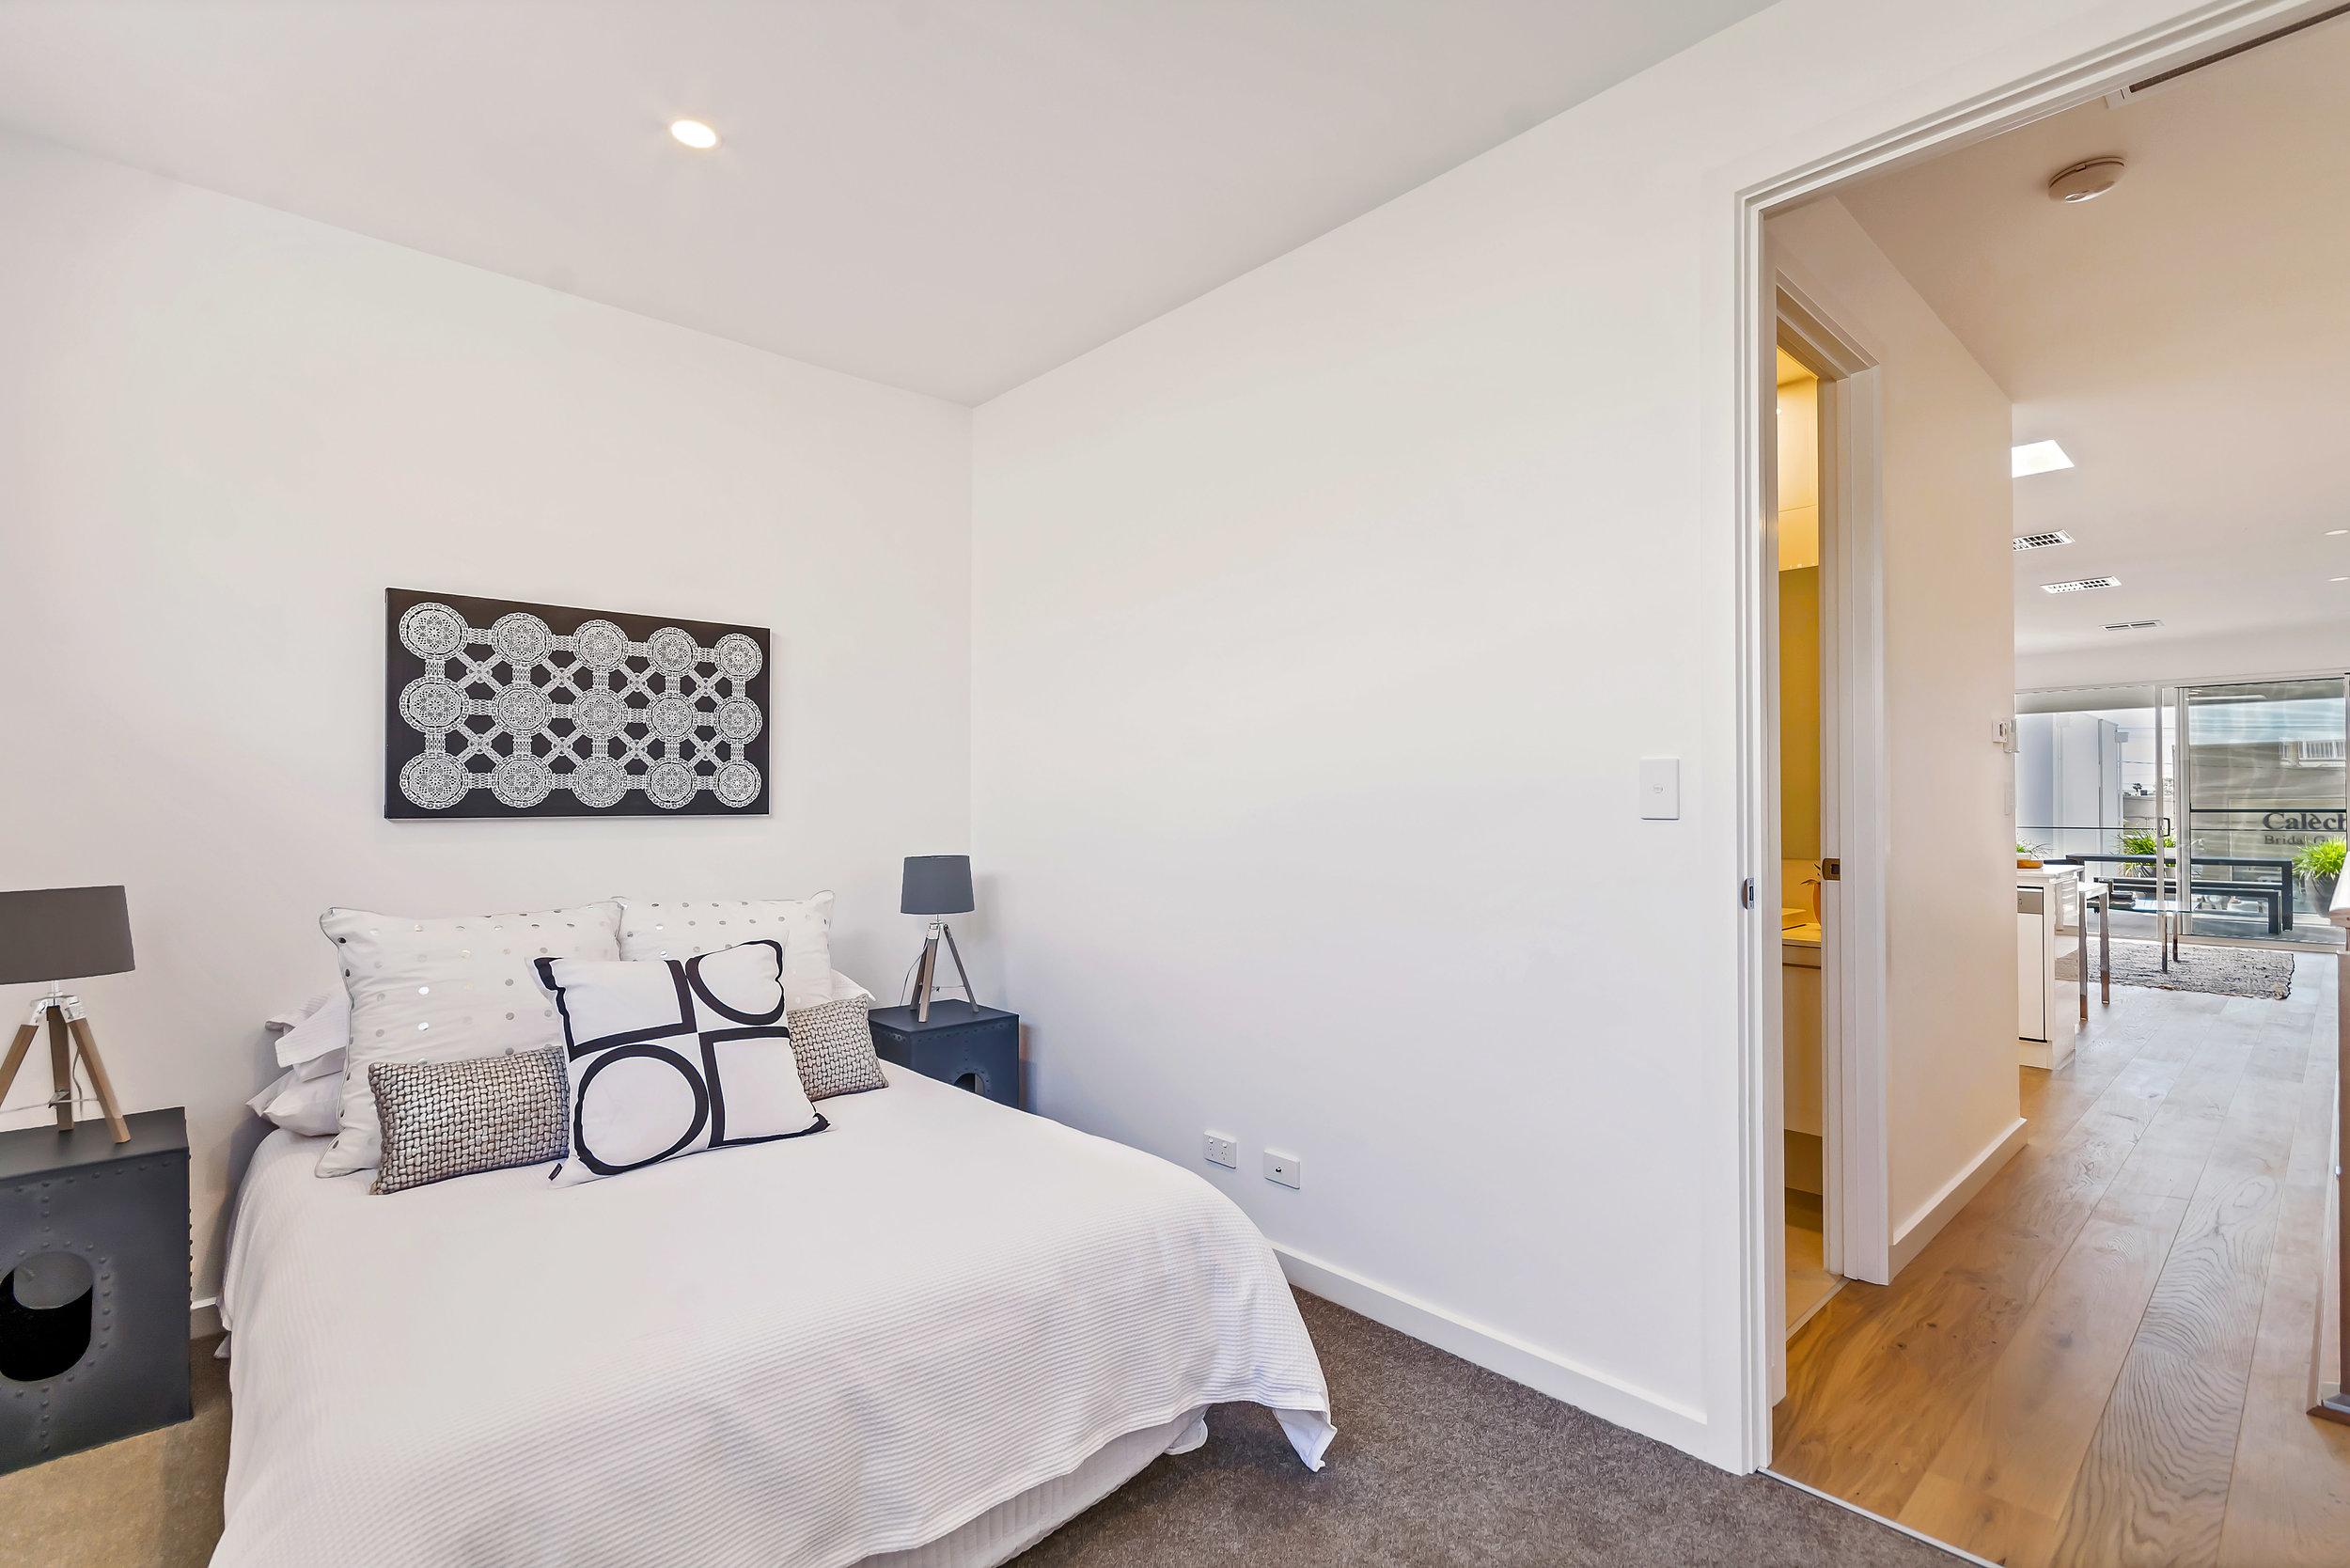 Bedroom 2 with floor to ceiling built-in robe